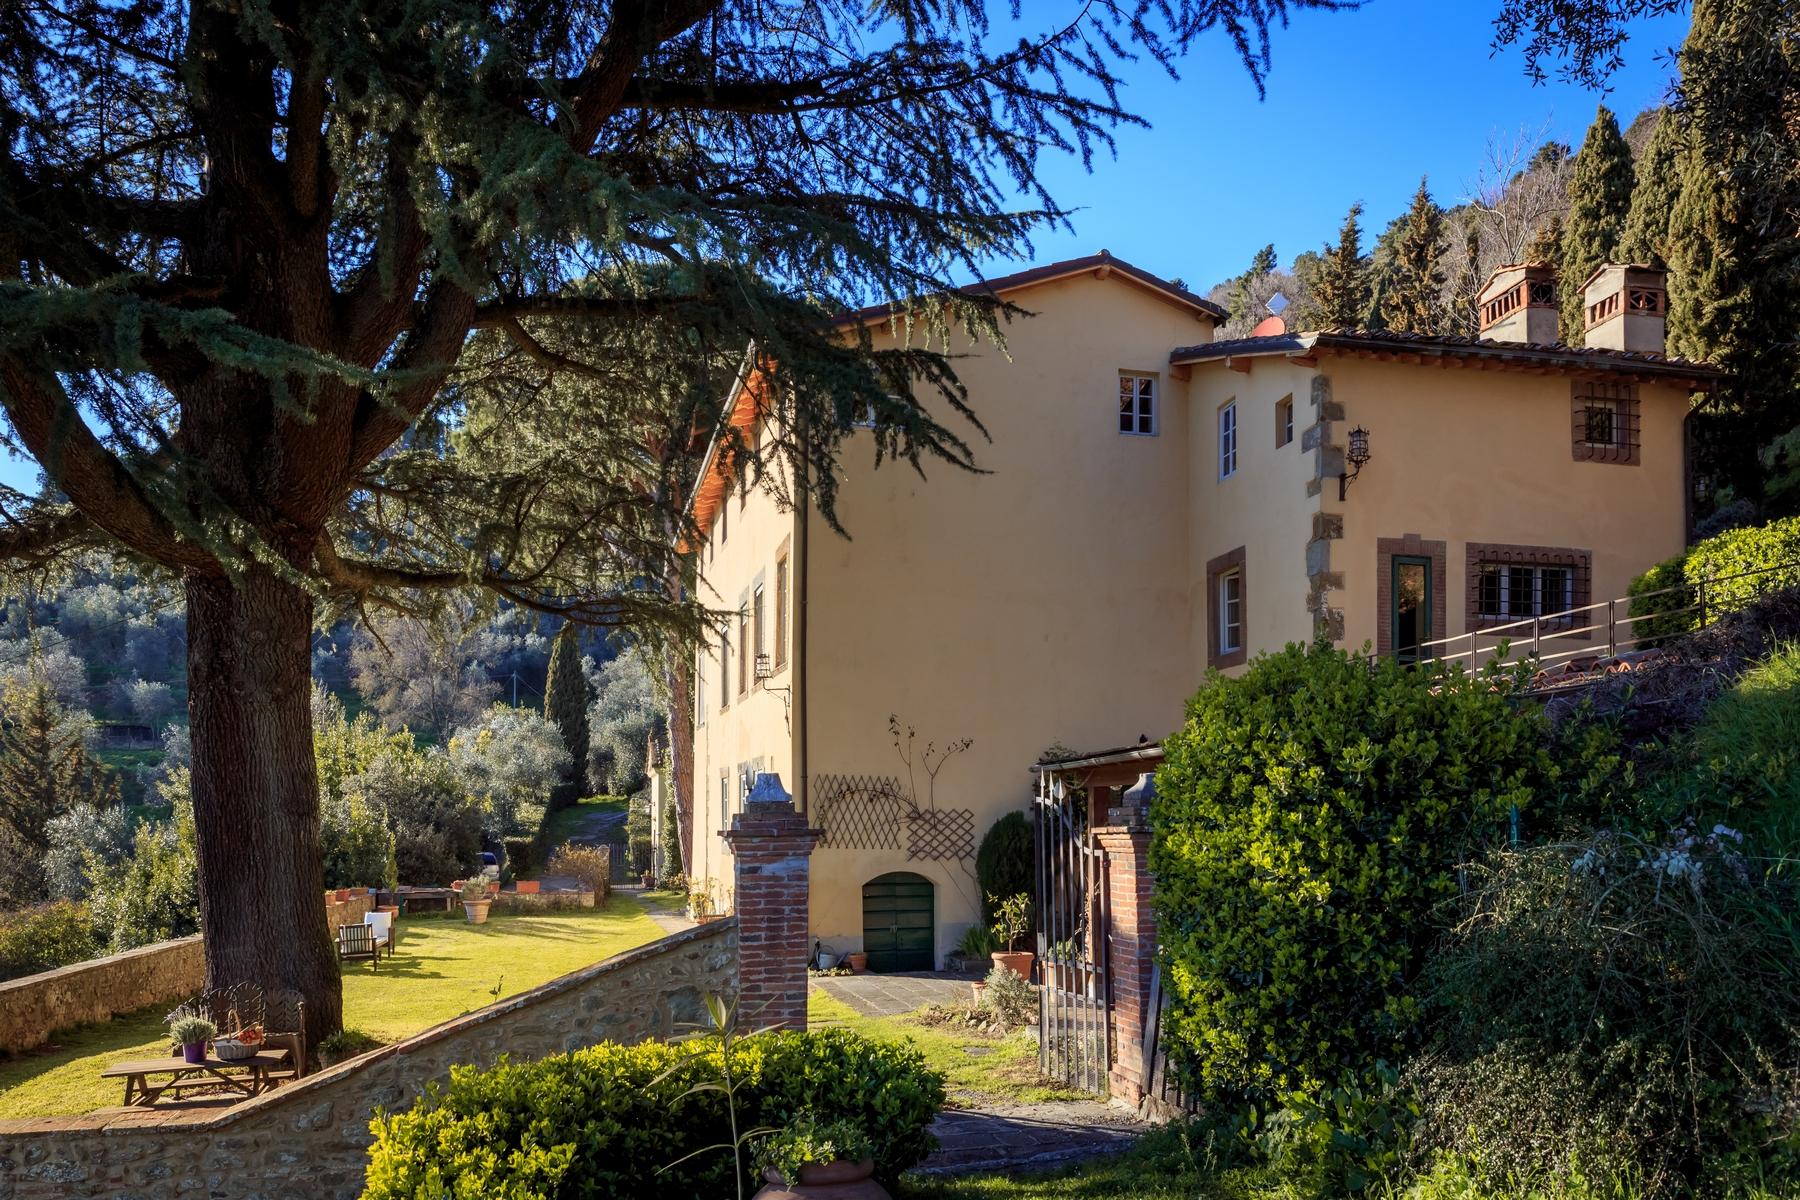 Villa in Vendita a Lucca: 5 locali, 550 mq - Foto 5